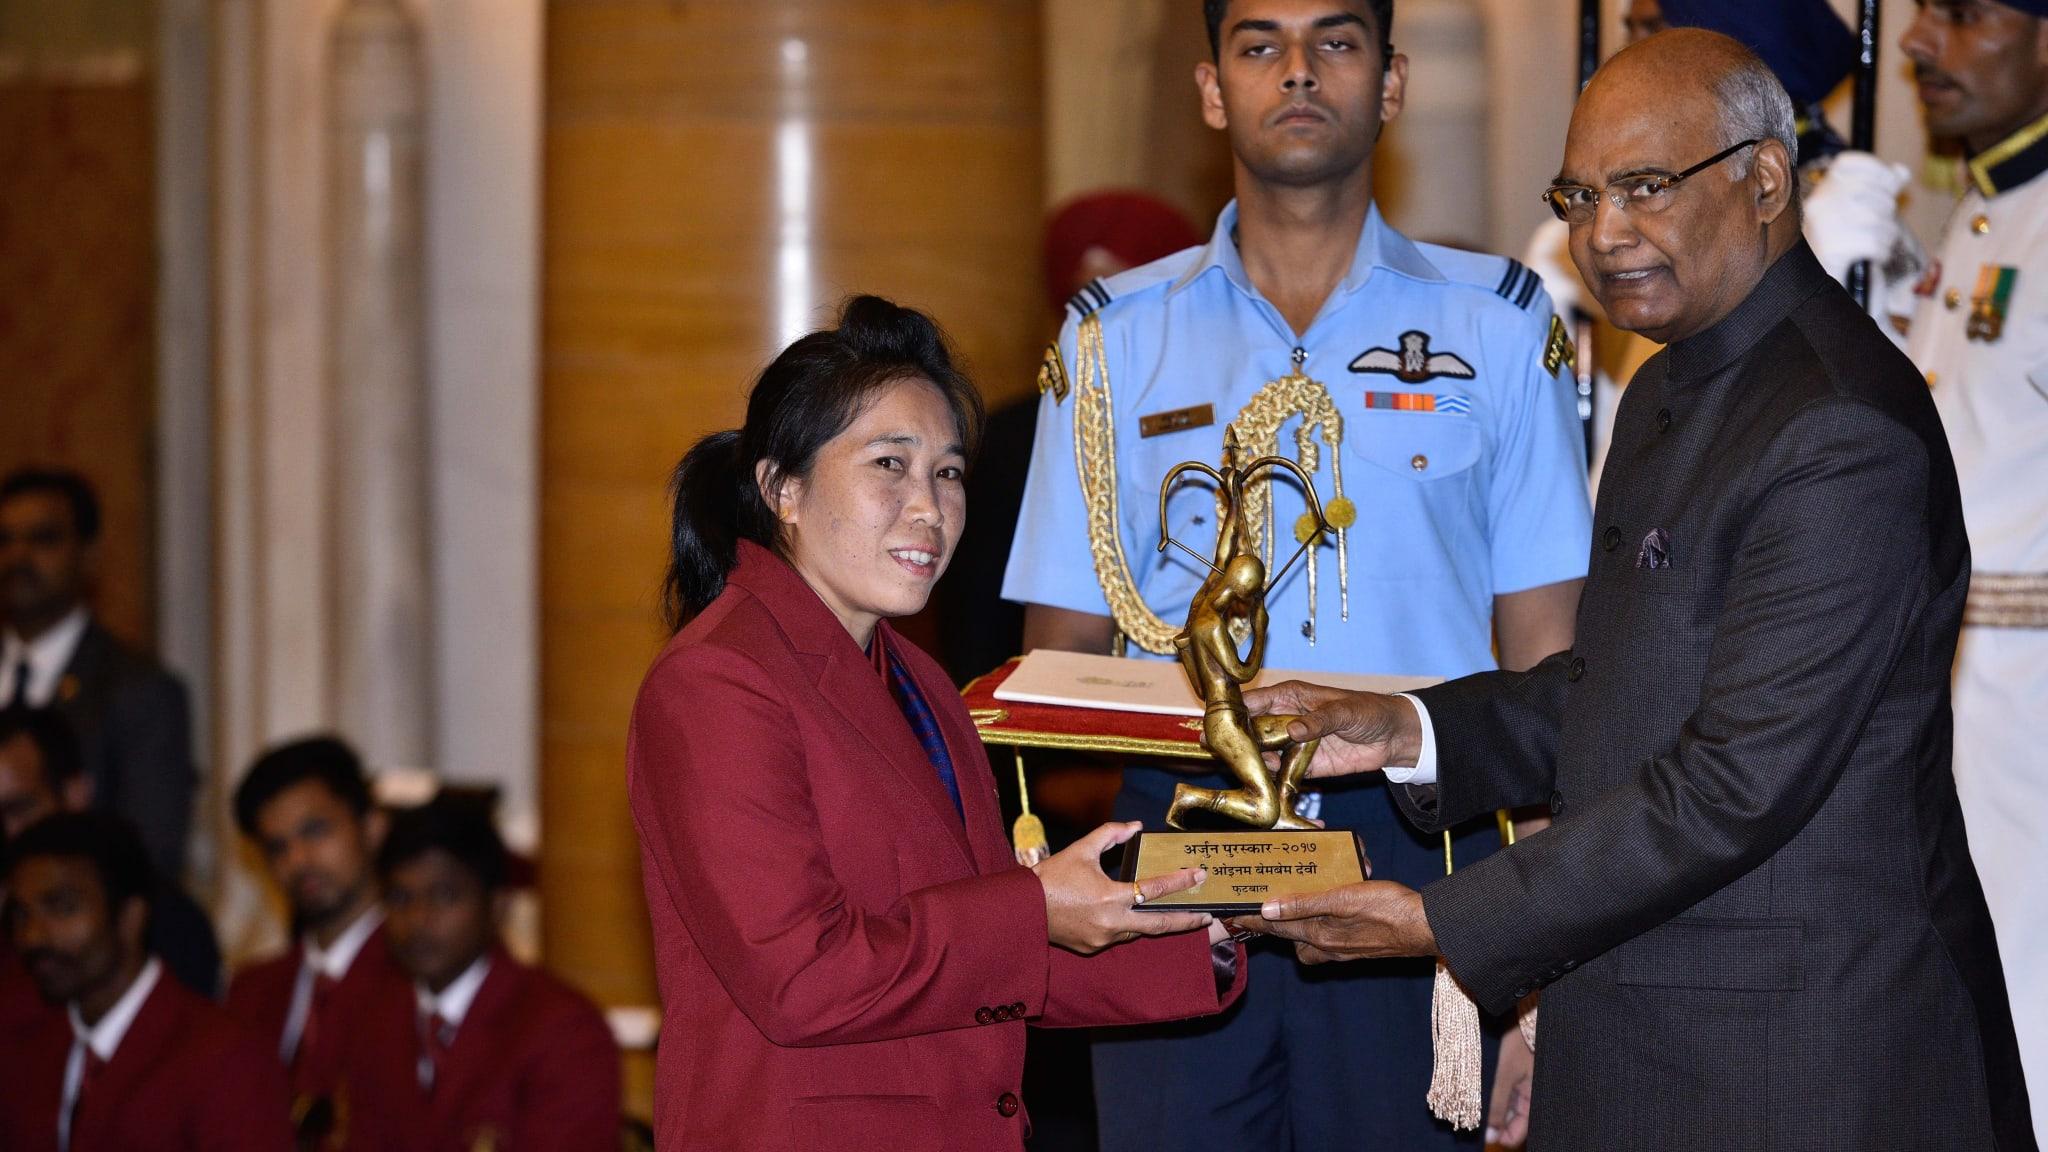 President Ram Nath Kovind presents the Arjuna Award, 2017 to Oinam Bembem Devi for Football on August 29, 2017 in New Delhi, India.